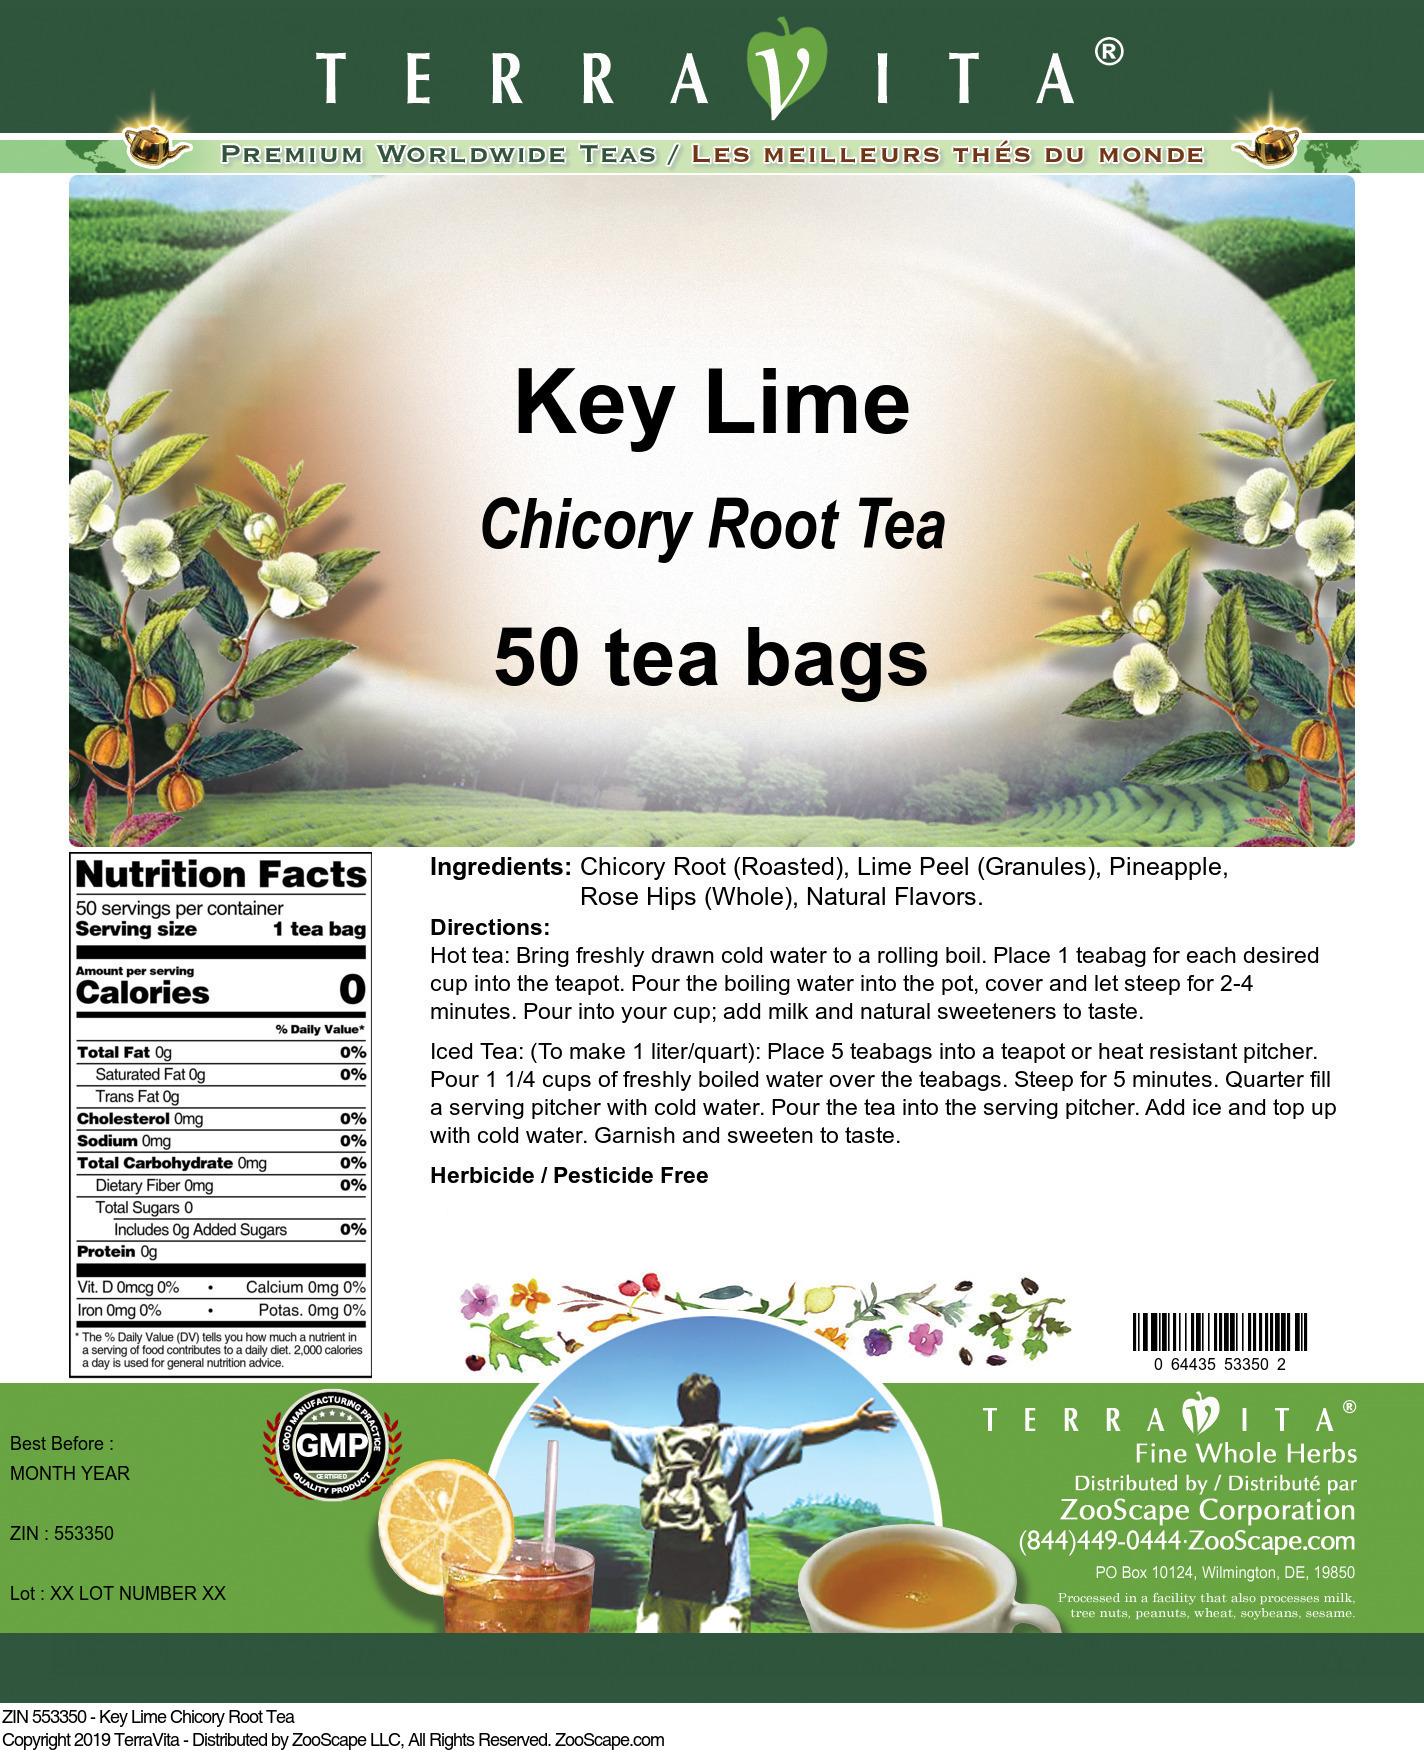 Key Lime Chicory Root Tea